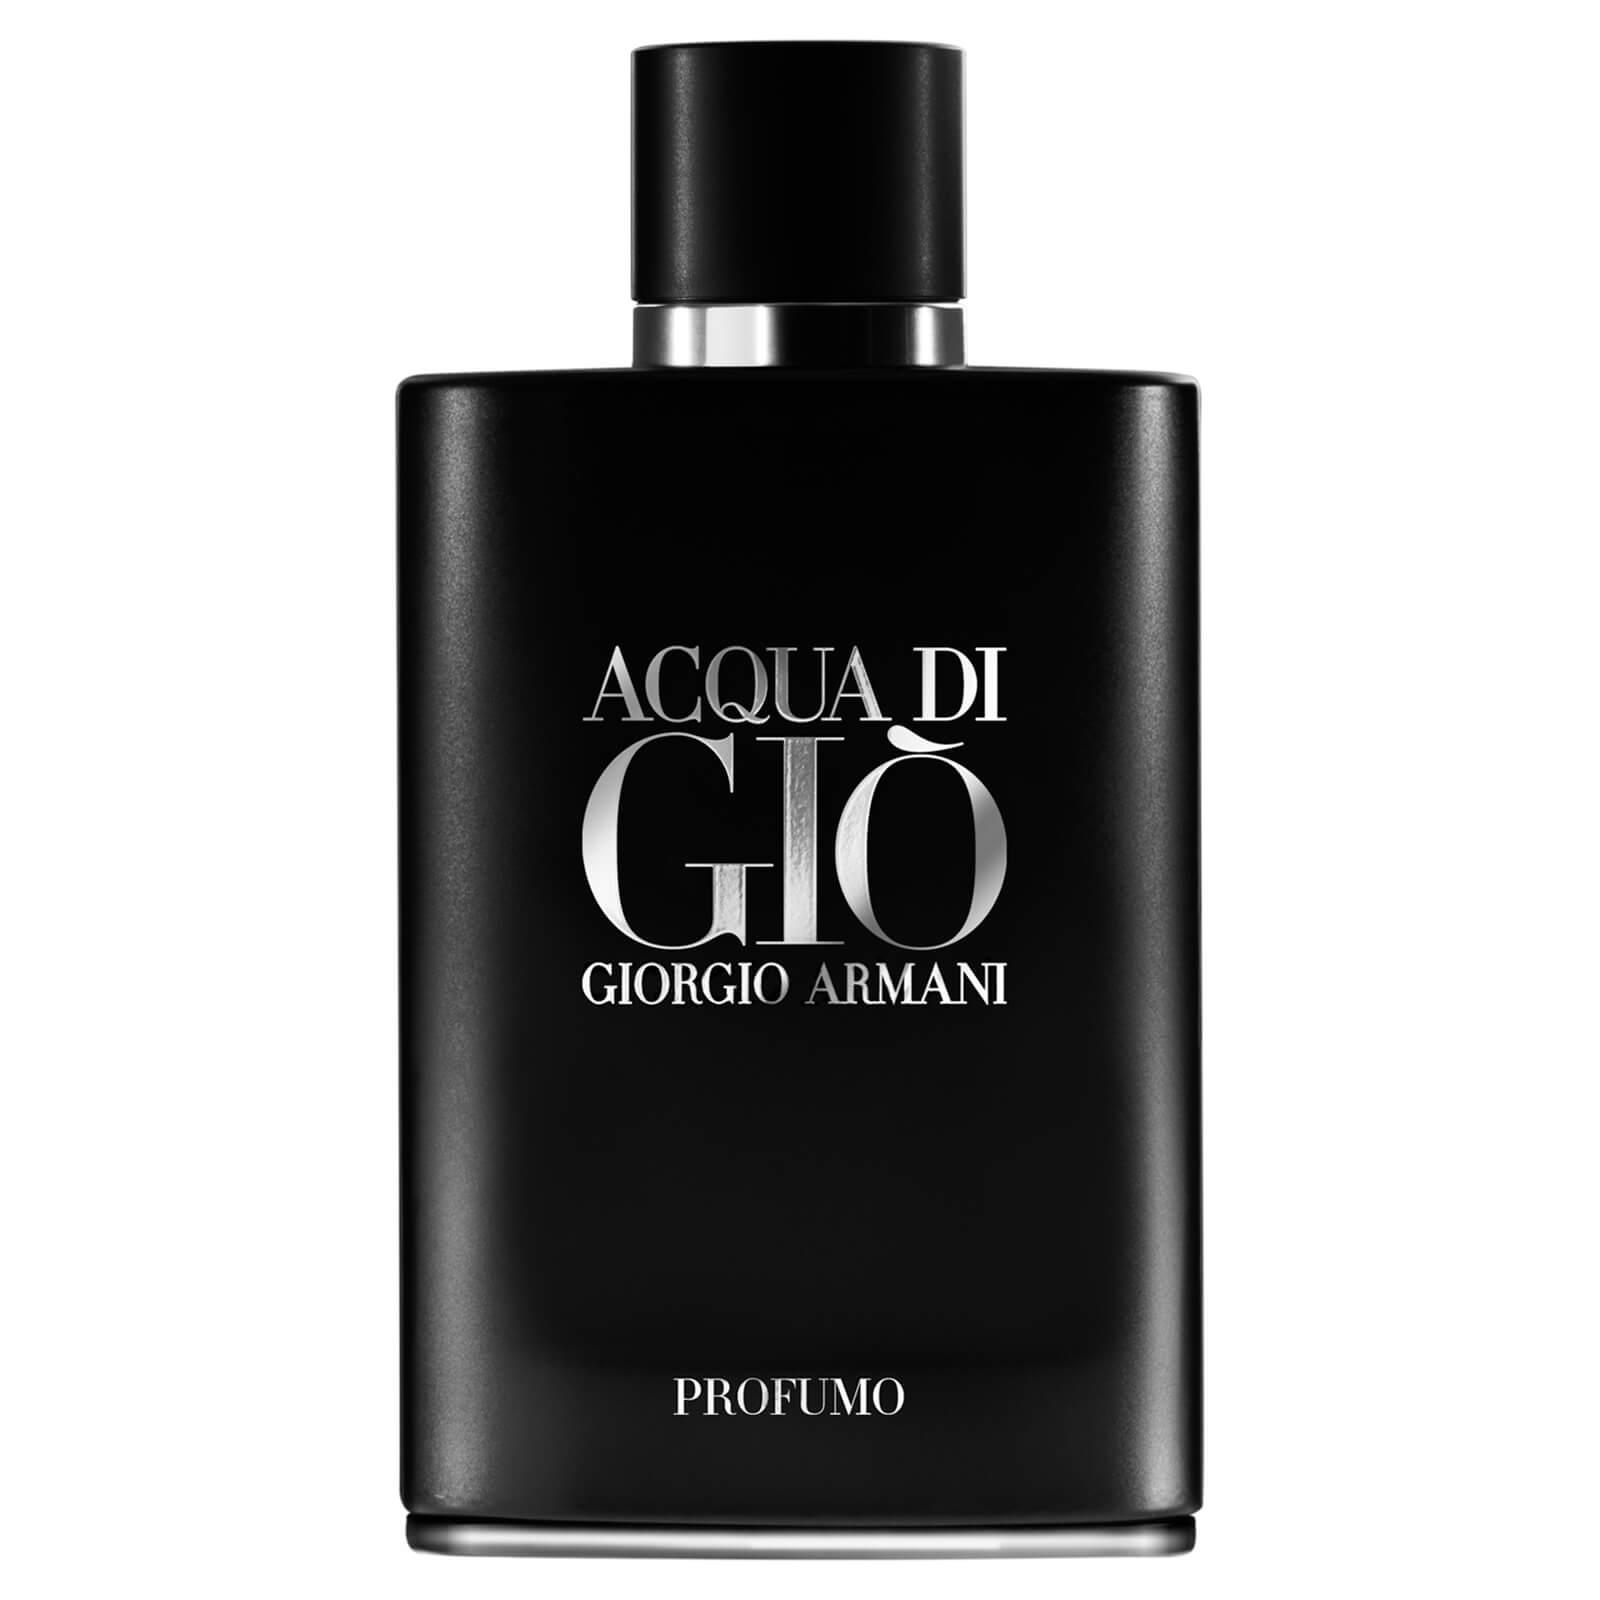 Release-Info zu außergewöhnliche Auswahl an Stilen Super süße Giorgio Armani Acqua Di Gio Homme Profumo Eau de Parfum